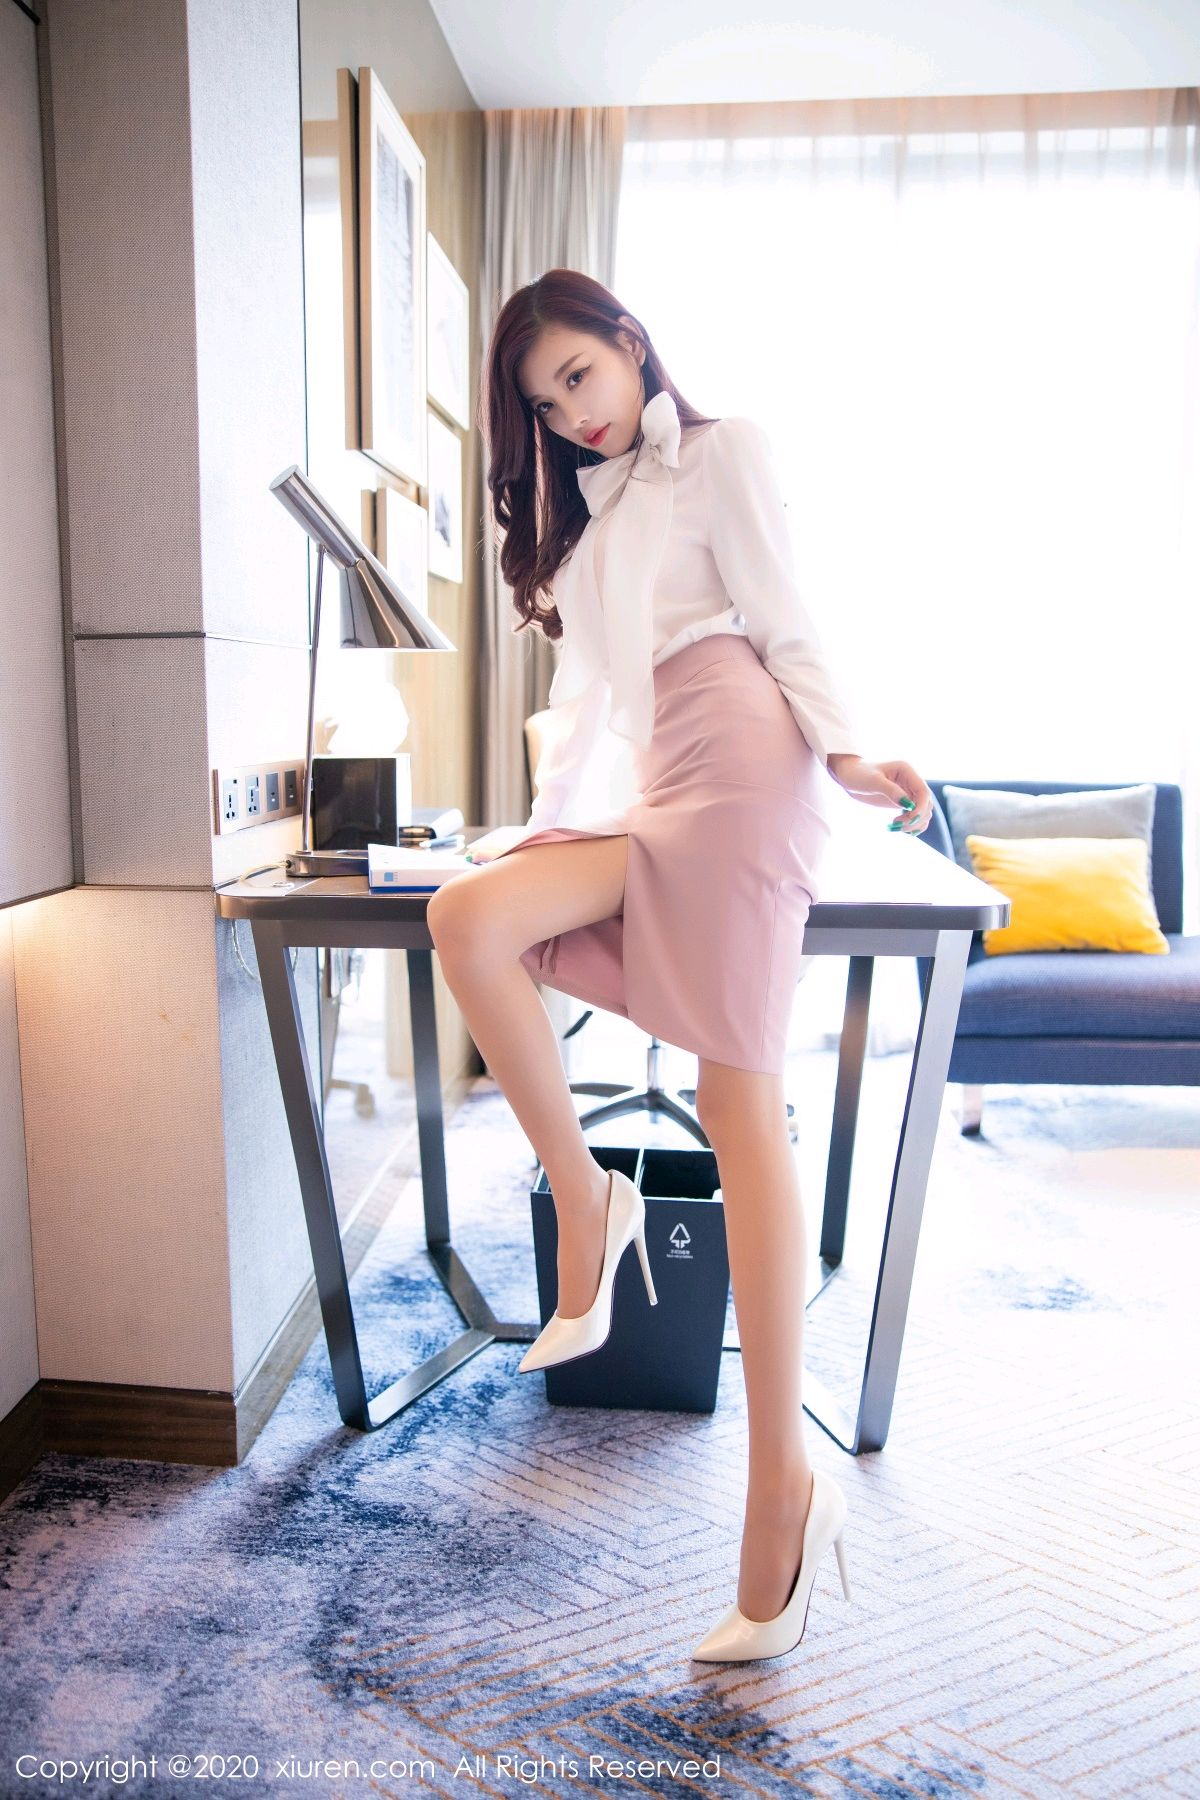 [XiuRen] Vol.2431 Yang Chen Chen 17P, Tall, Underwear, Uniform, Xiuren, Yang Chen Chen